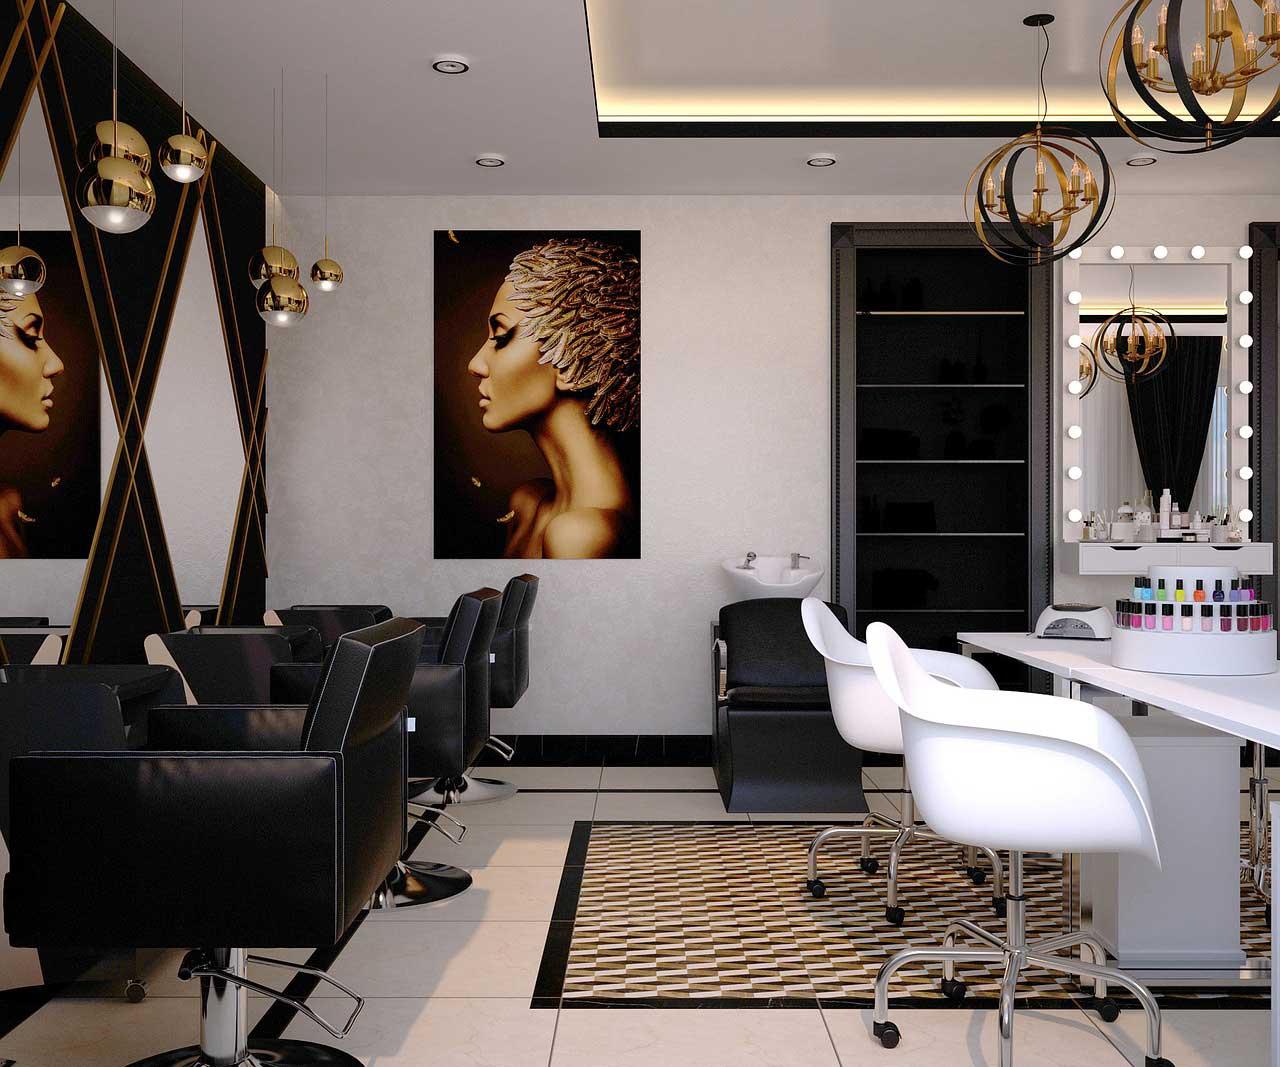 Optimale Beleuchtung für Friseursalon durch LED Panel